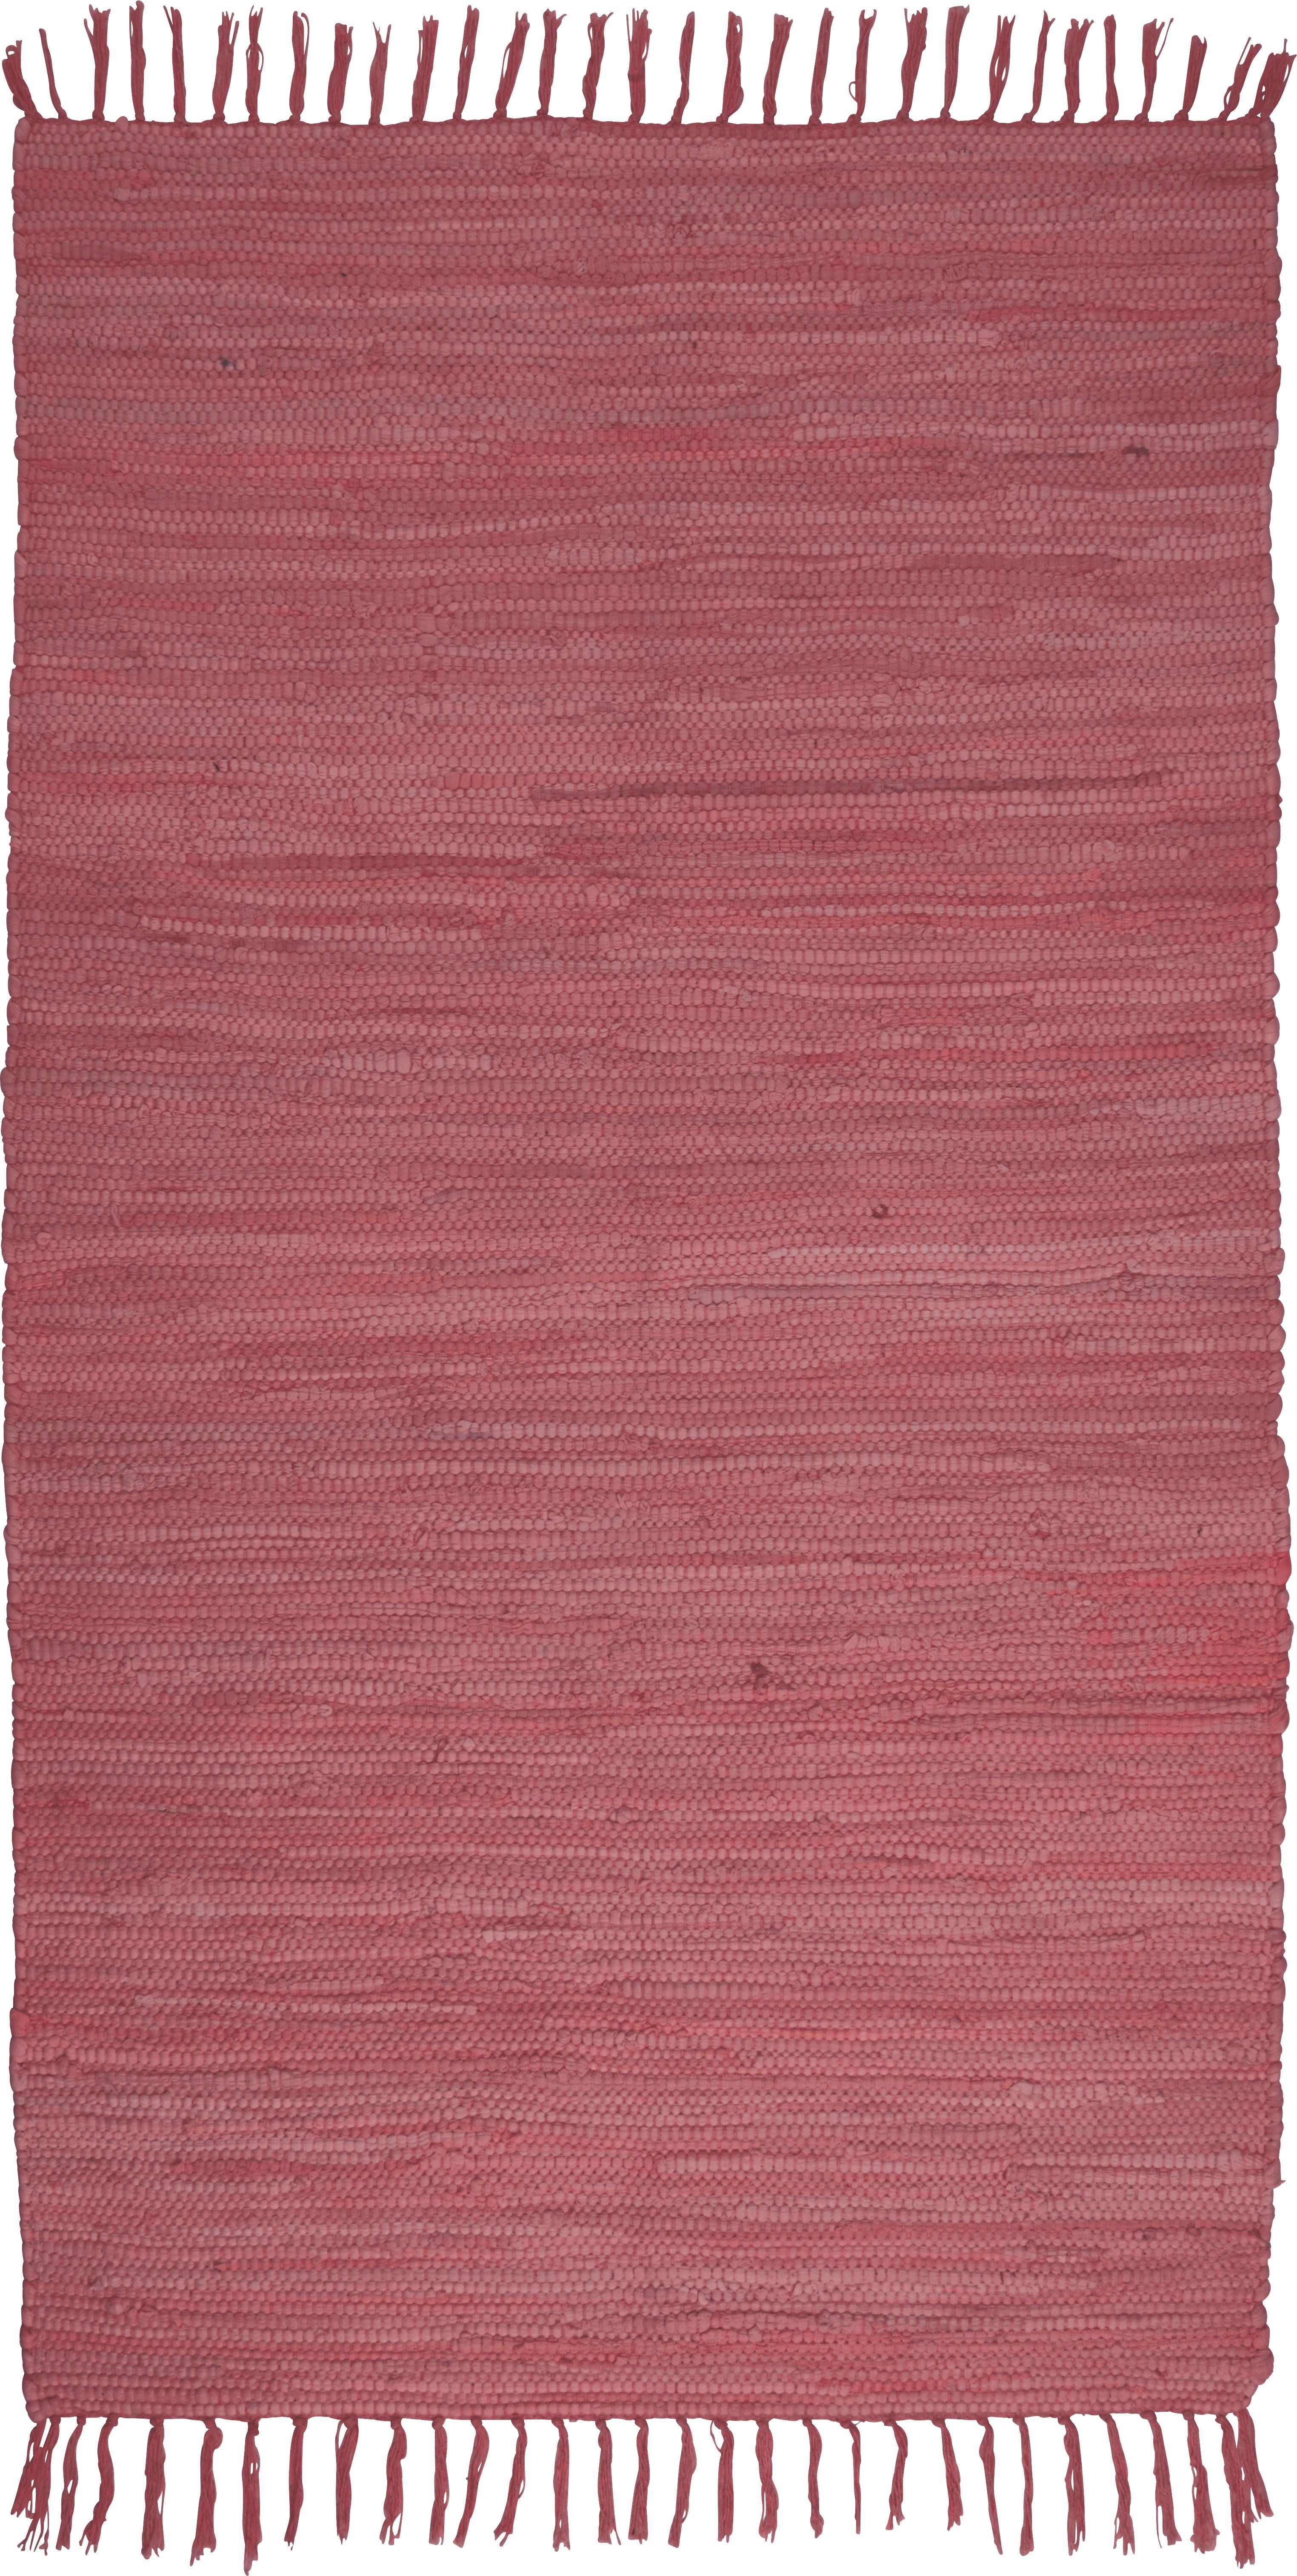 Fleckerlteppich Julia in Rot, ca. 60x90cm - Bordeaux, Textil (60/90cm) - MÖMAX modern living